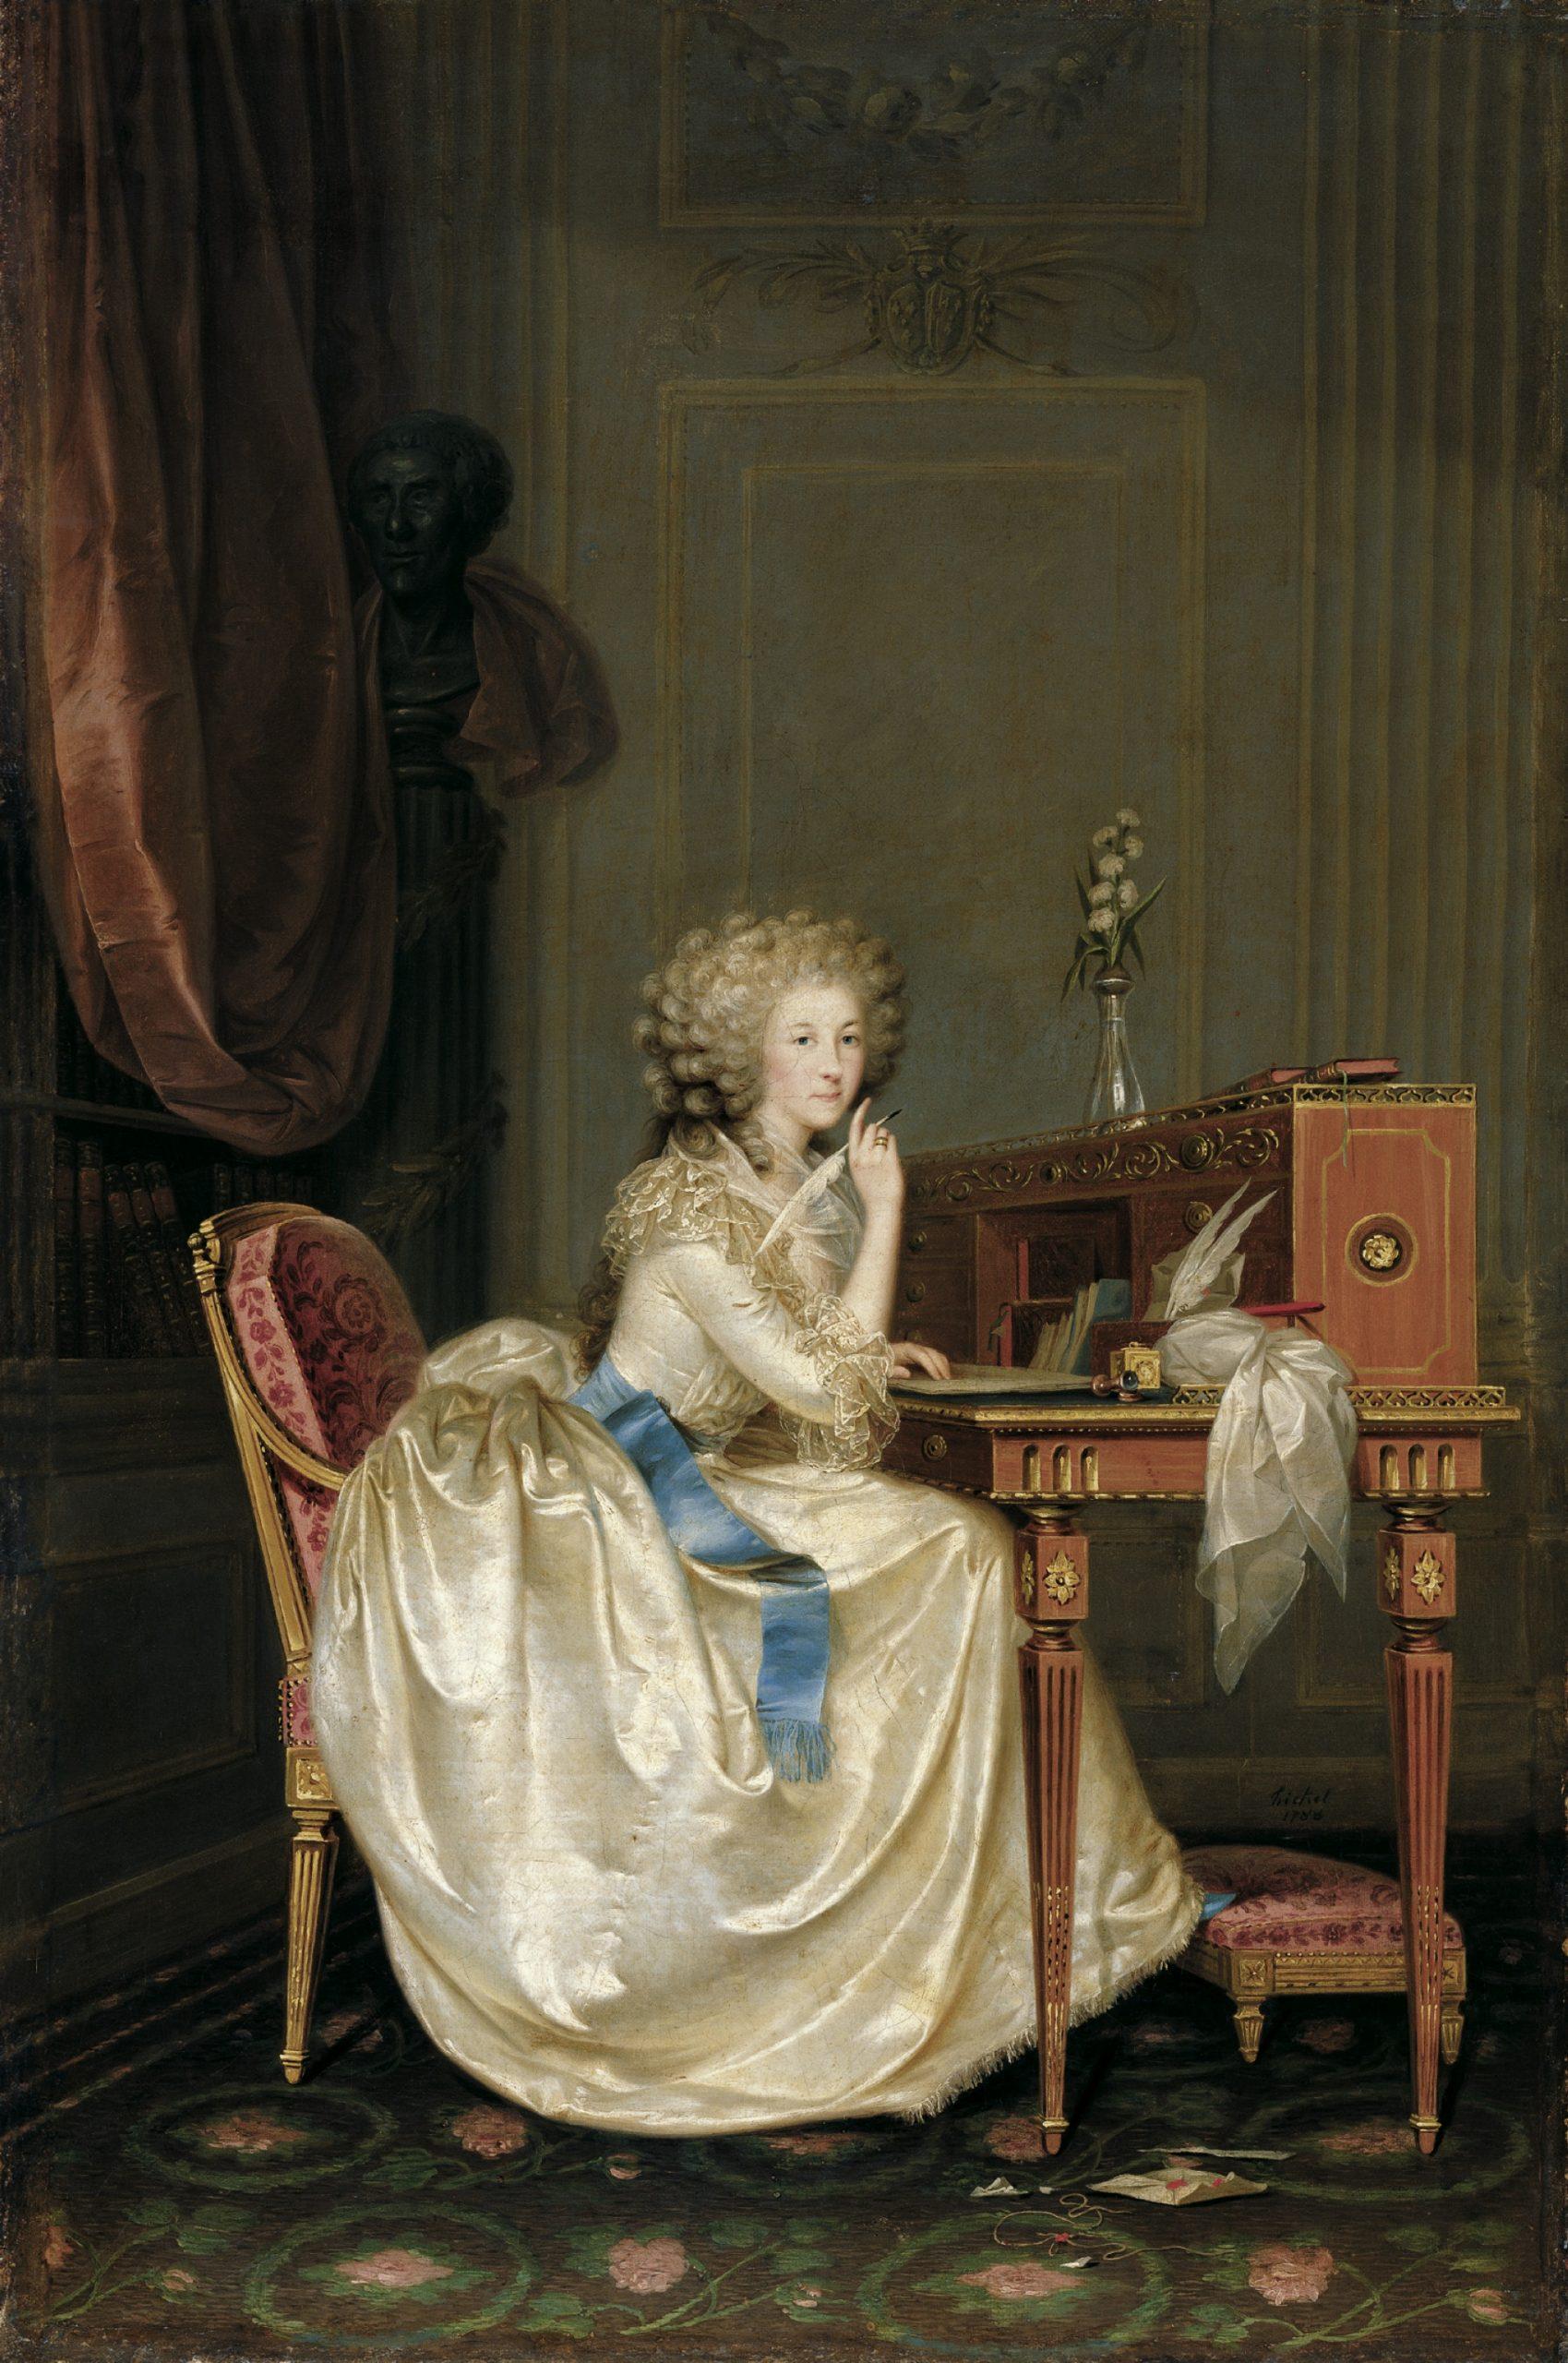 Anton Hickel, Portrait of Marie-Thérèse, Princesse de Lamballe, 1788 via Wikimedia Commons